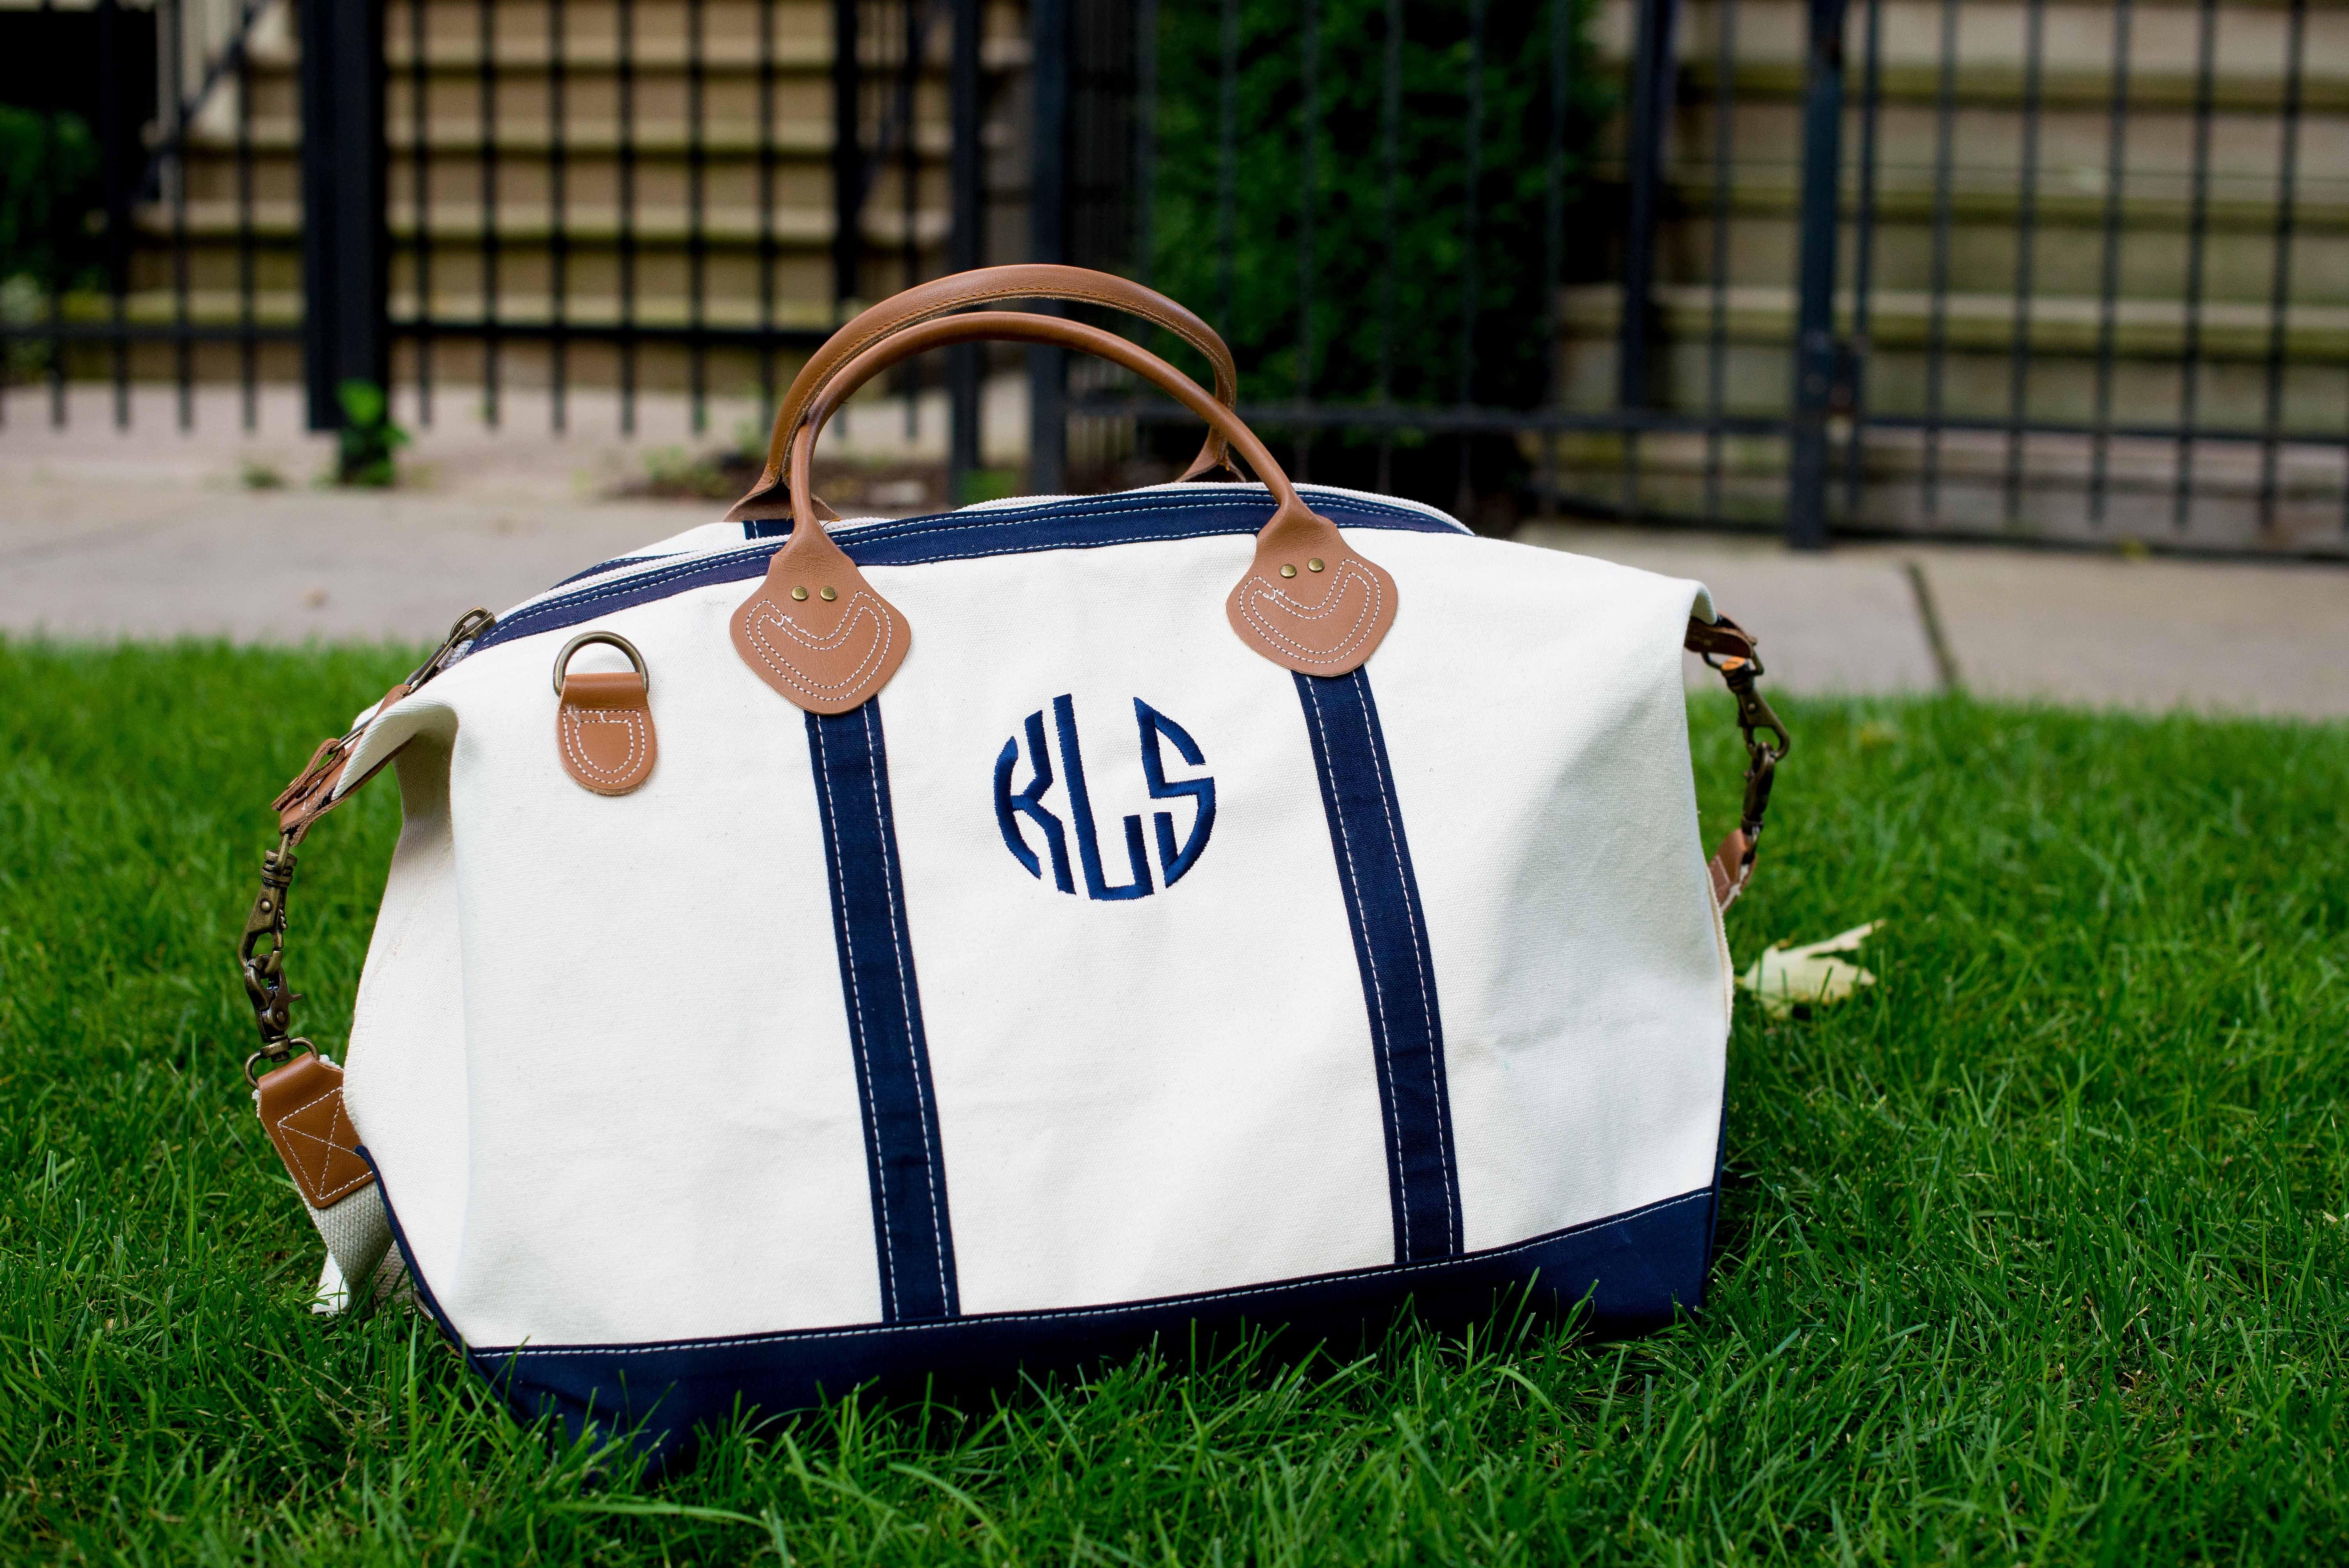 The Monogrammed Duffle Bag